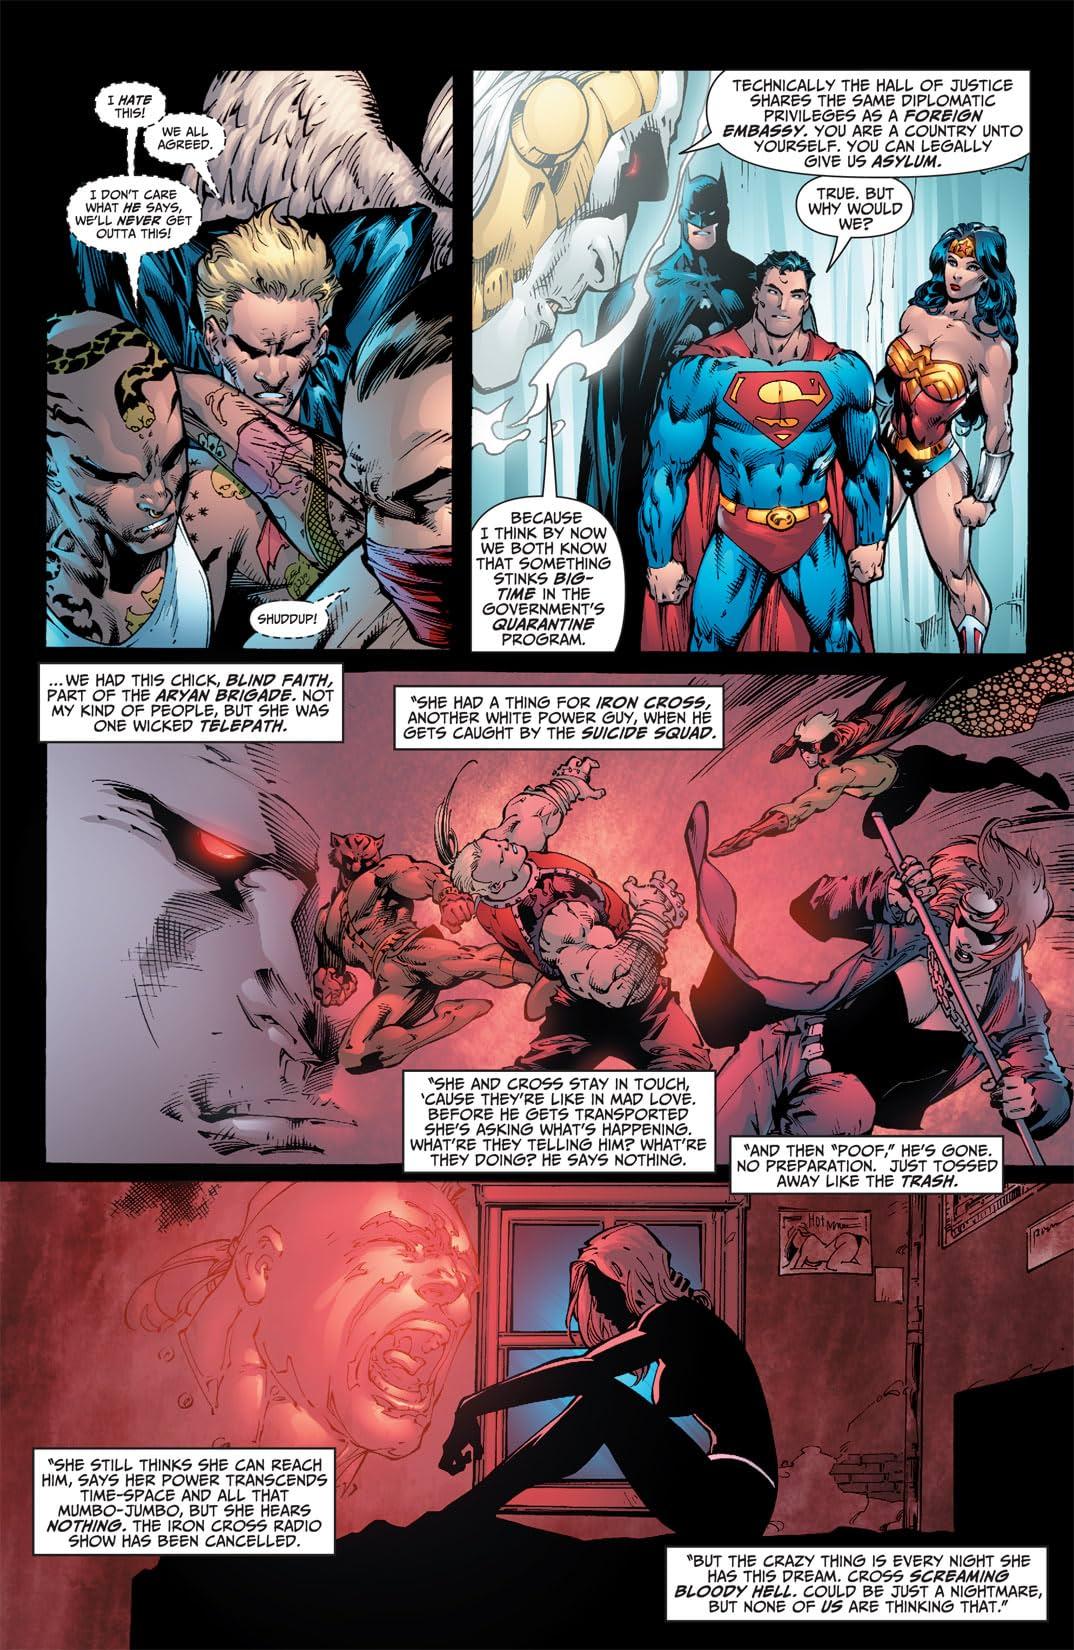 Justice League of America (2006-2011) #18